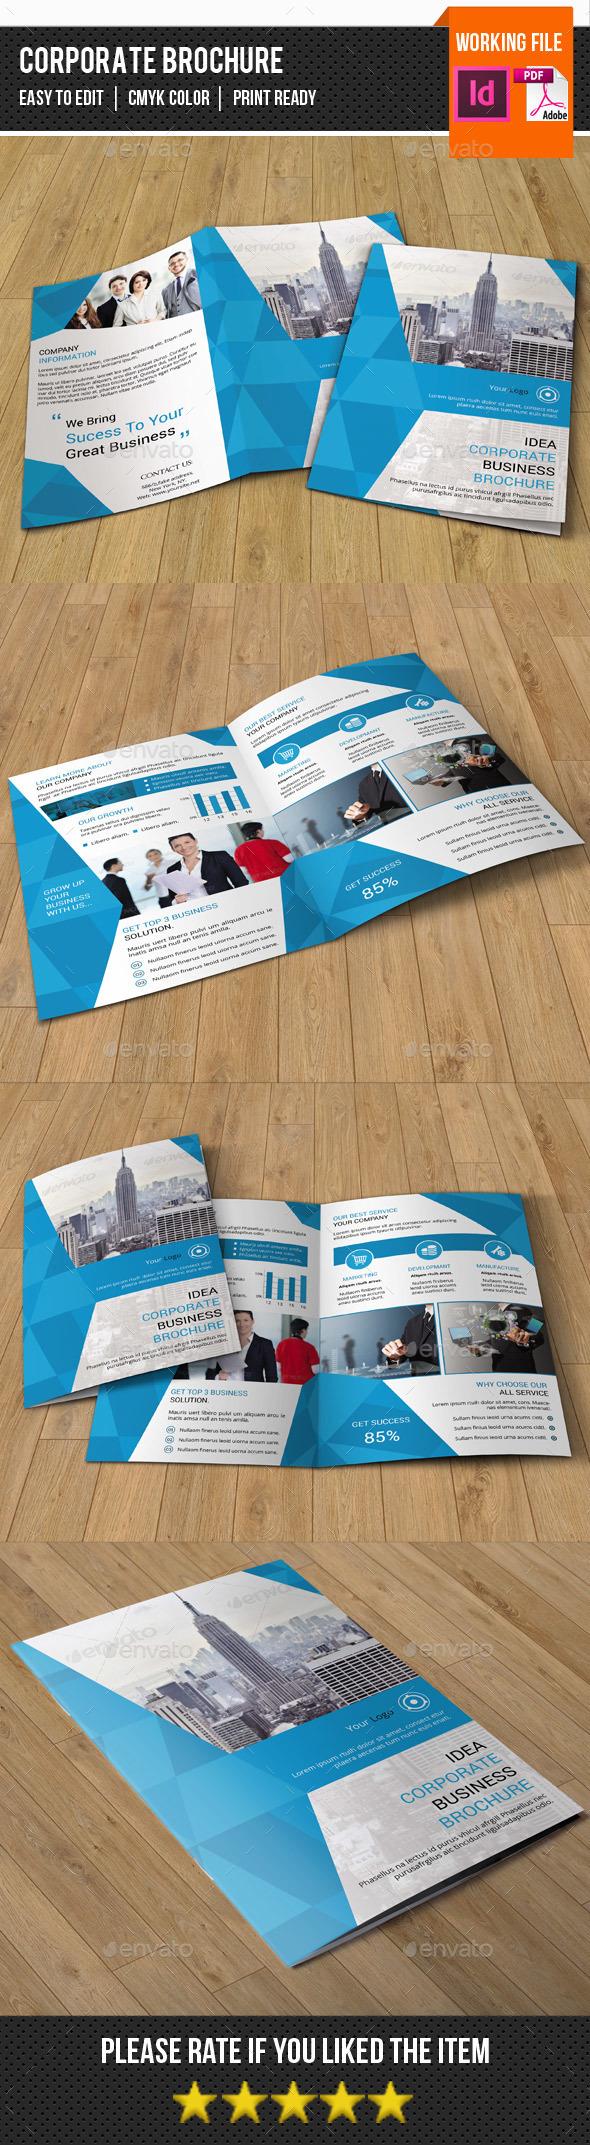 Bifold Business Brochure-V335 - Corporate Brochures